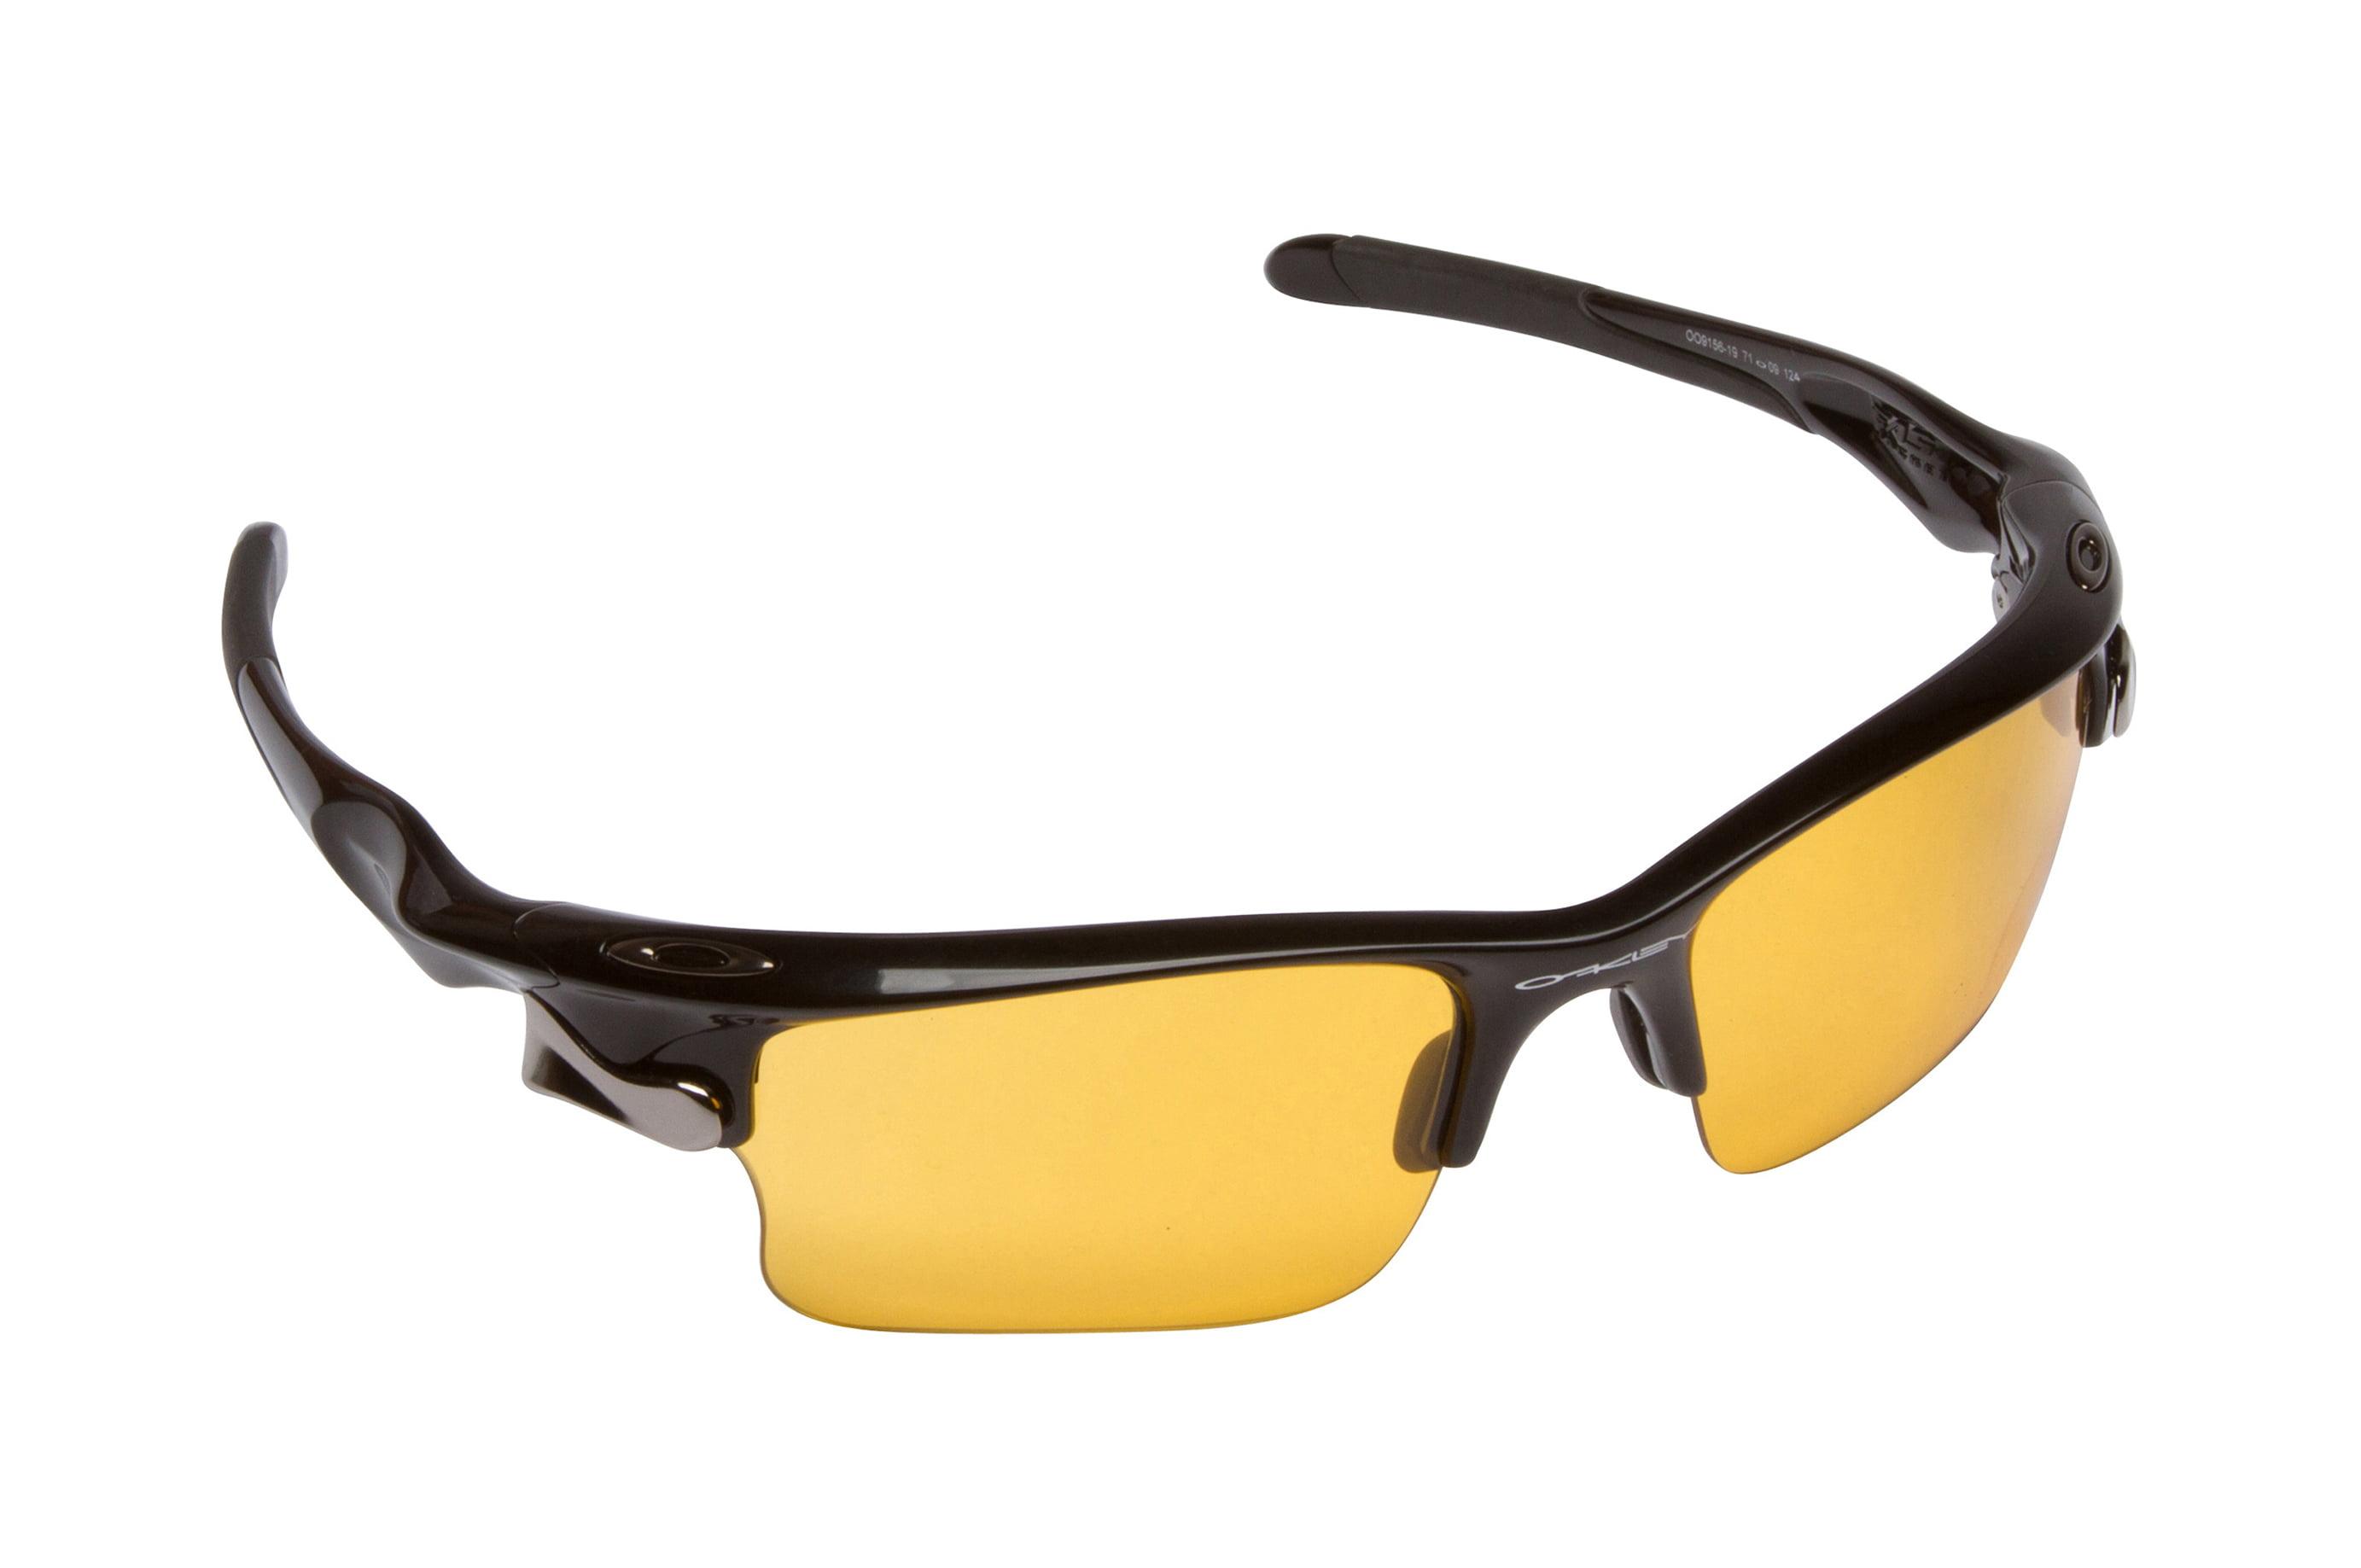 af1e923c29d Seek Optics - Fast Jacket XL Asian Fit Replacement Lenses Hi Yellow by SEEK  fits OAKLEY - Walmart.com